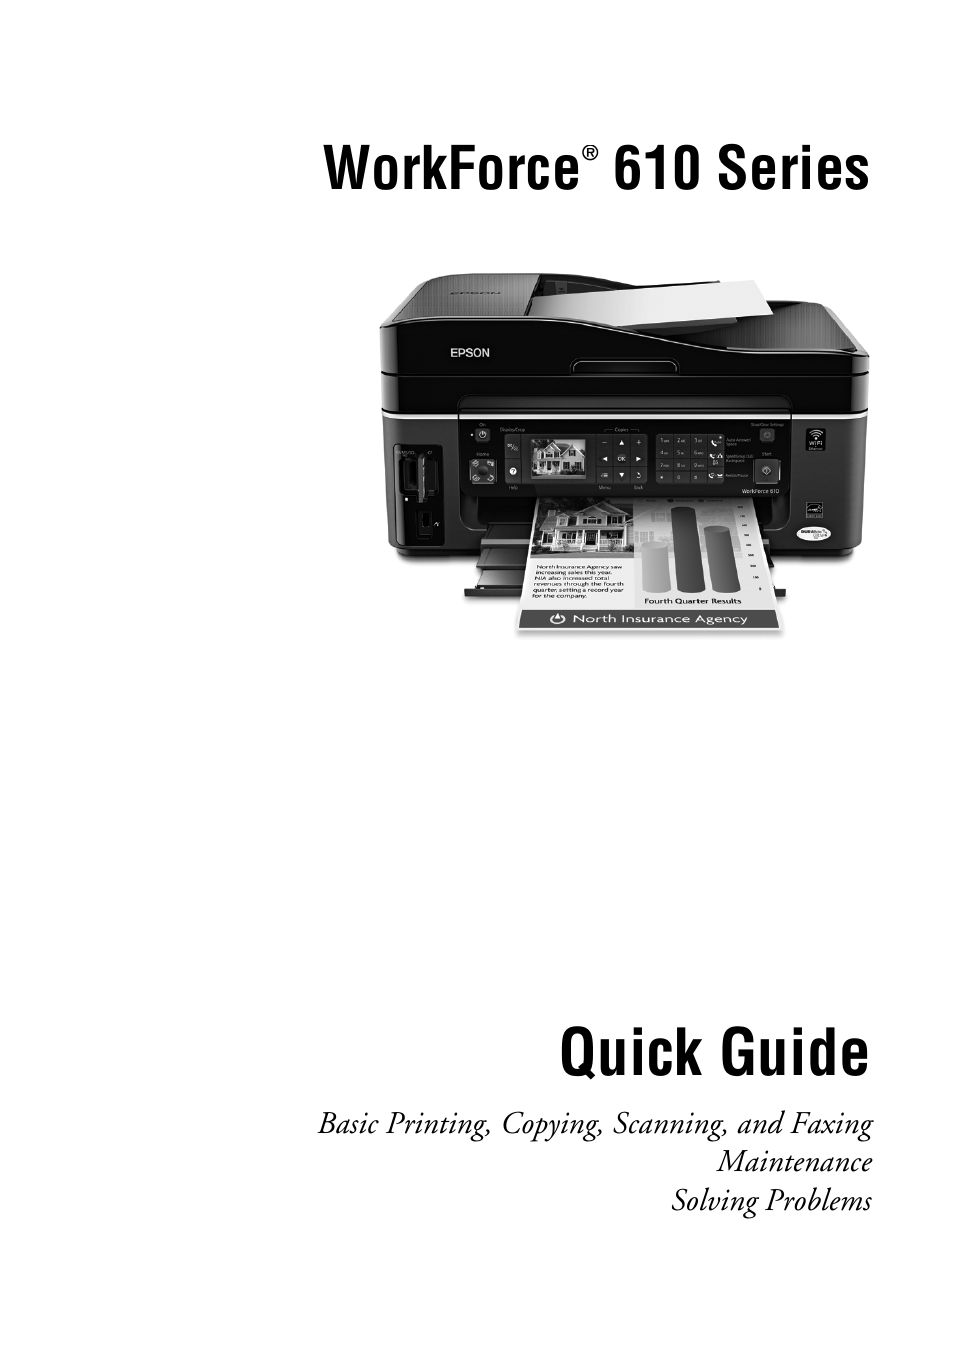 epson workforce 610 series user manual 60 pages rh manualsdir com Epson Workforce 610 Ink Cartridge Epson Workforce 610 Ink